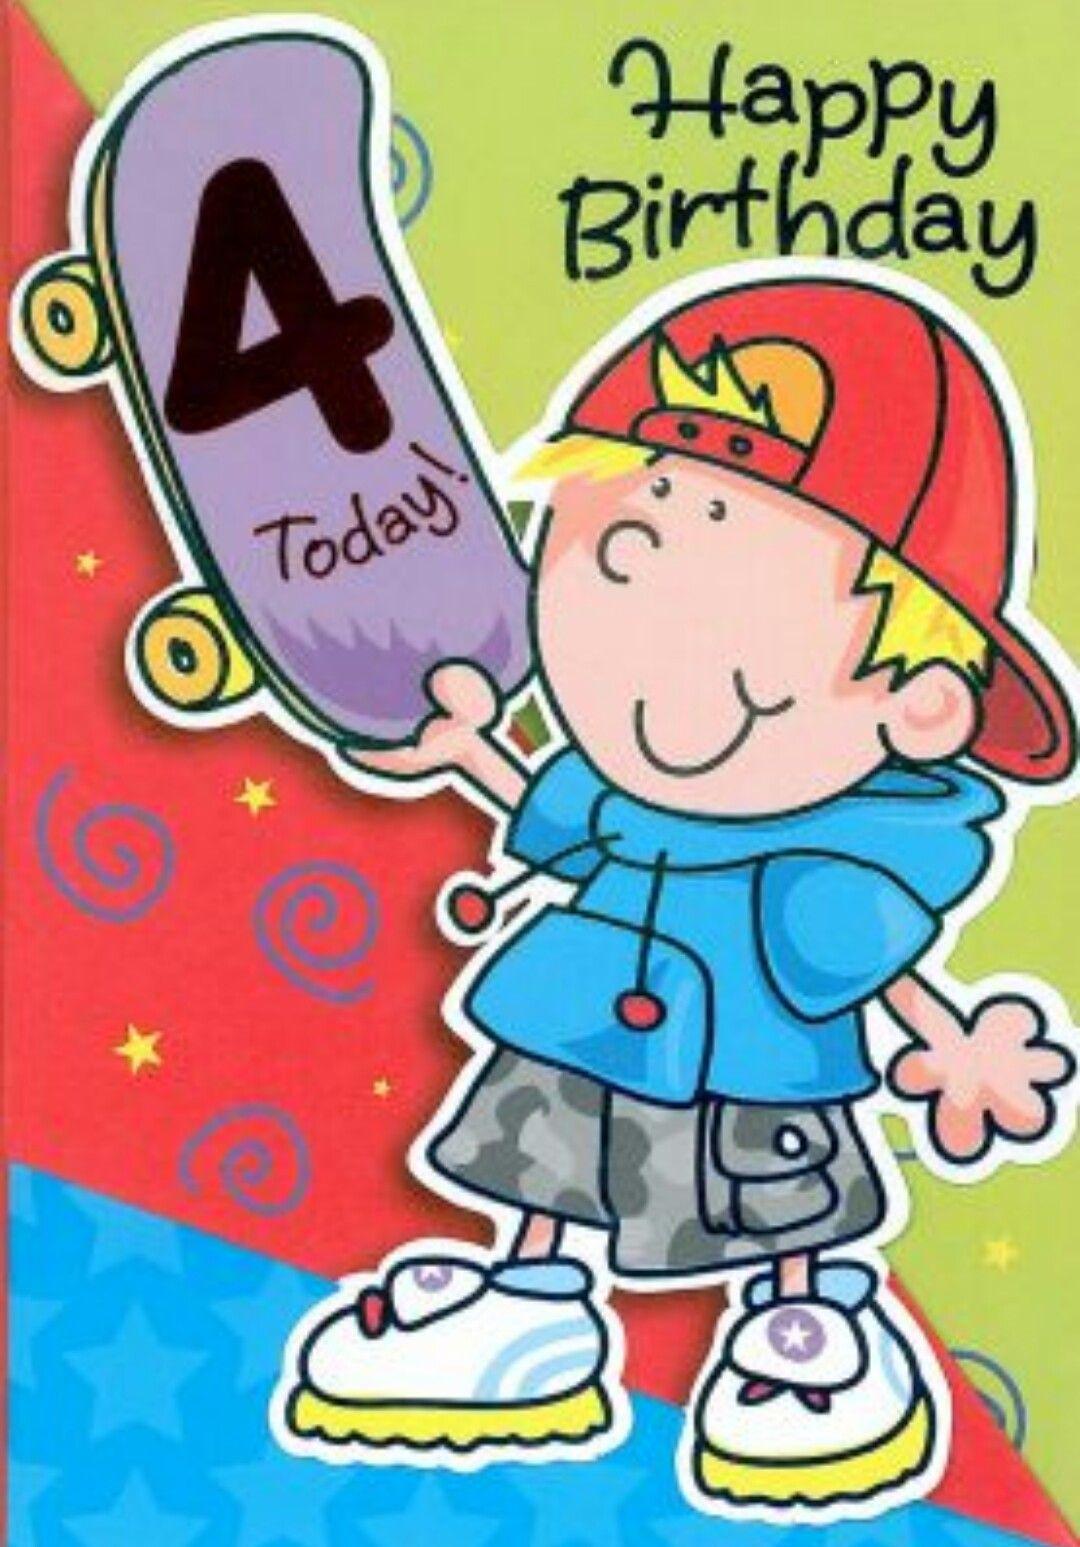 Happy 4th Birthday Max! ☆♡ 4th birthday boys, Happy